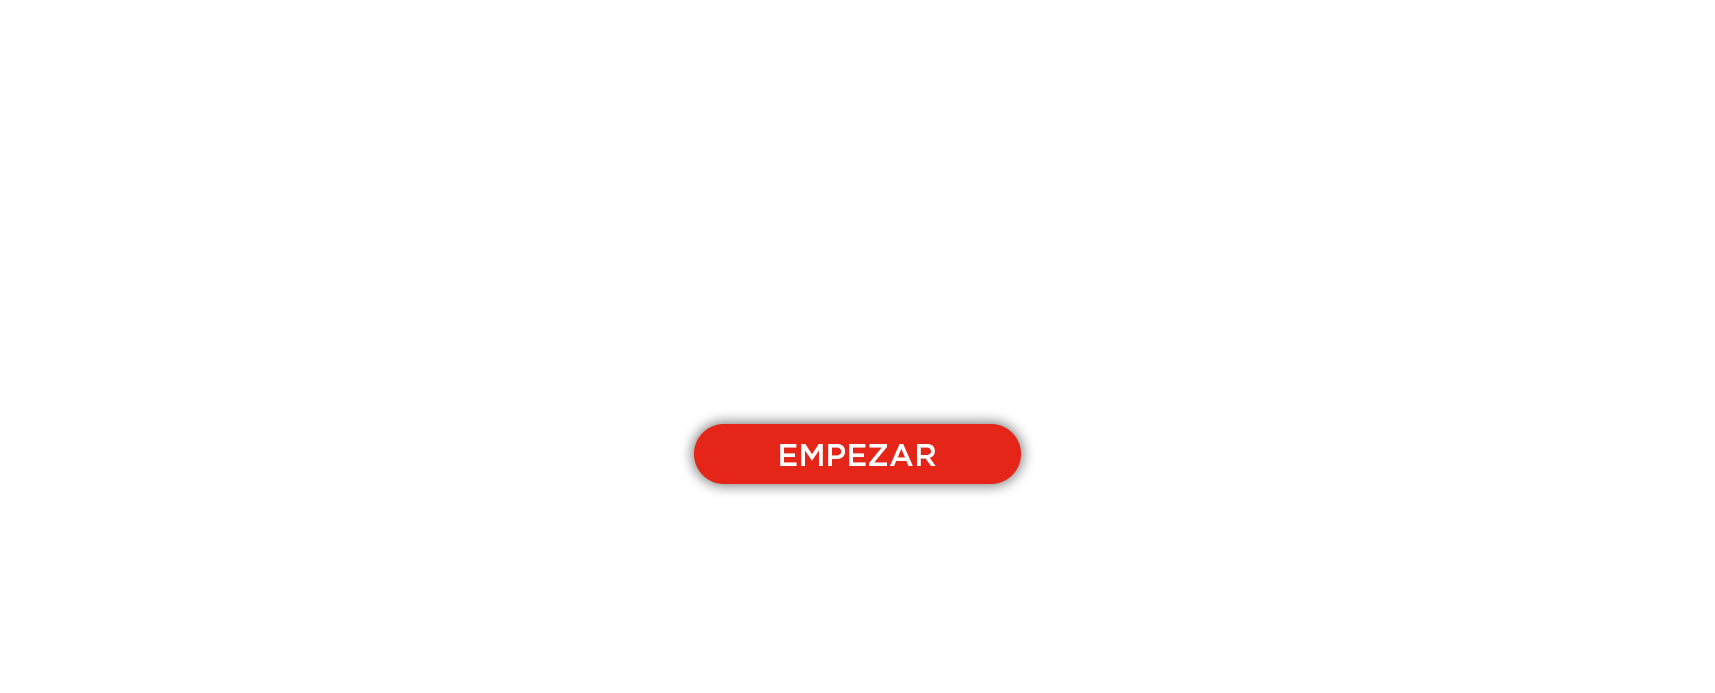 covid-text